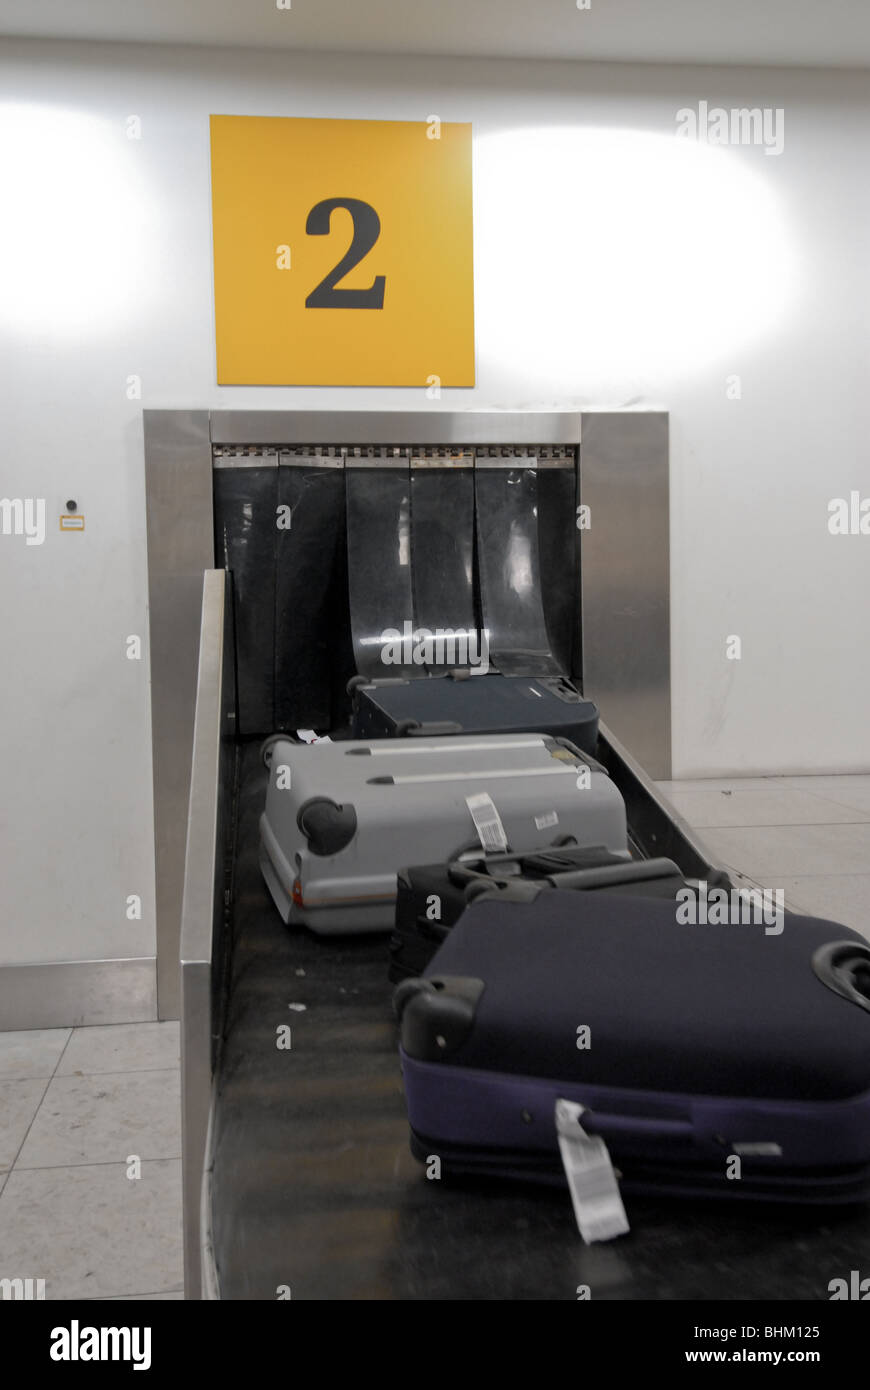 luggage on a conveyor belt - Stock Image